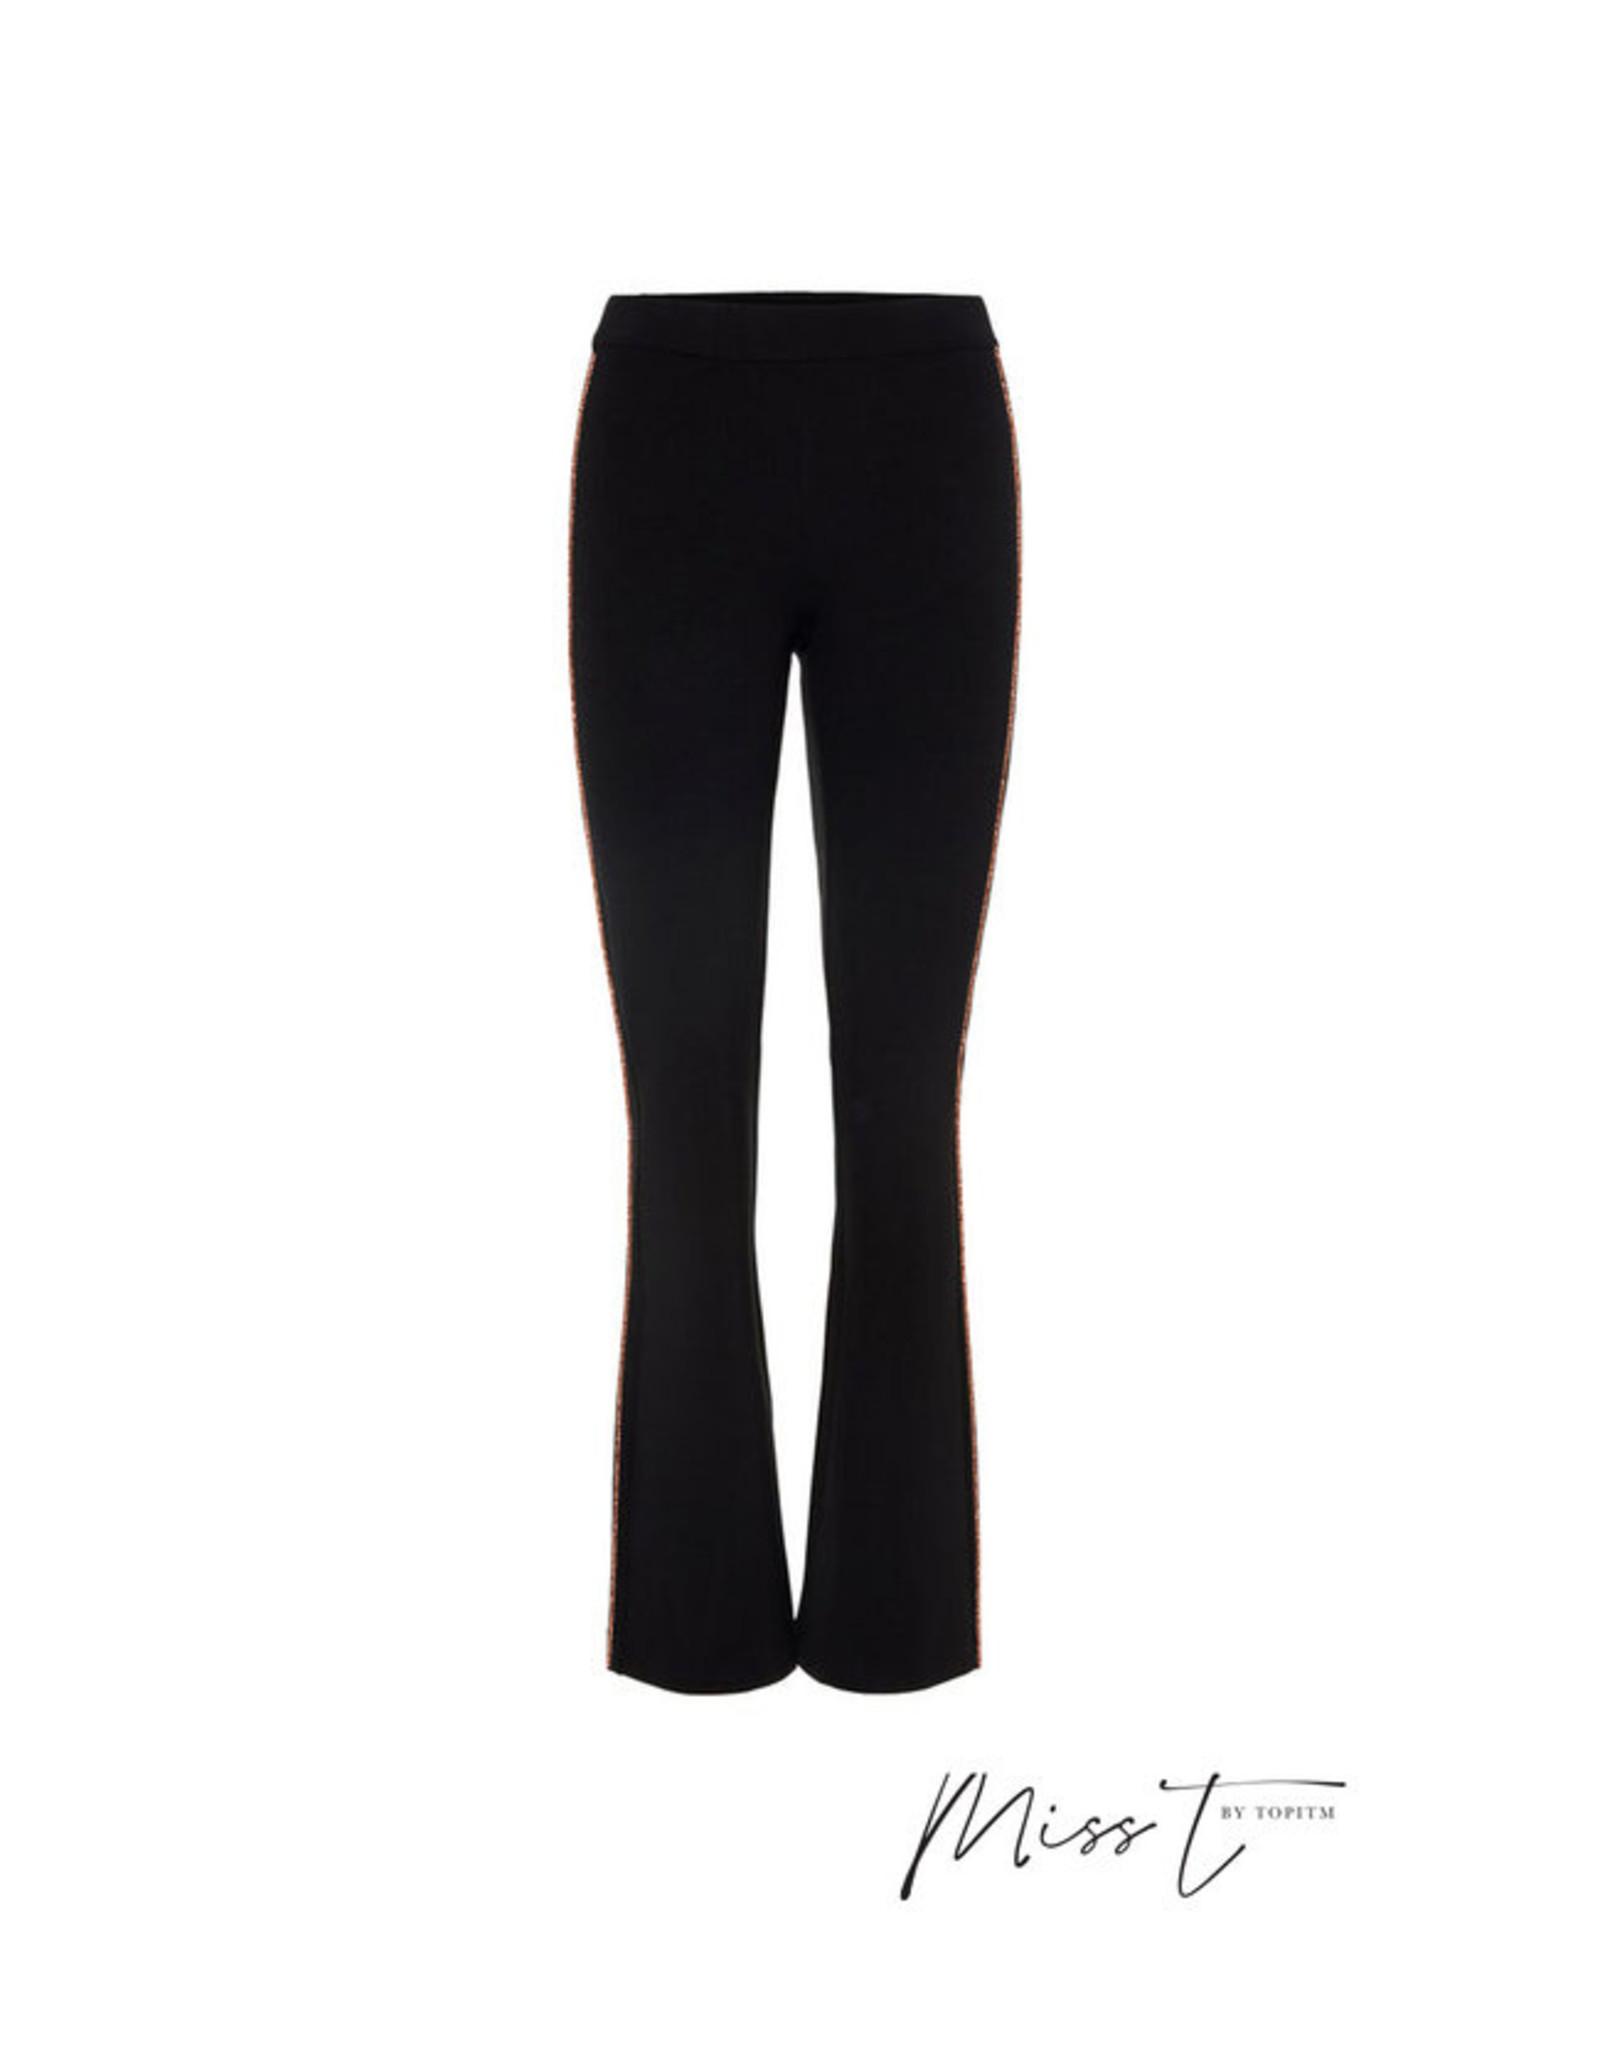 Topitm Miss T Joke flare pants black